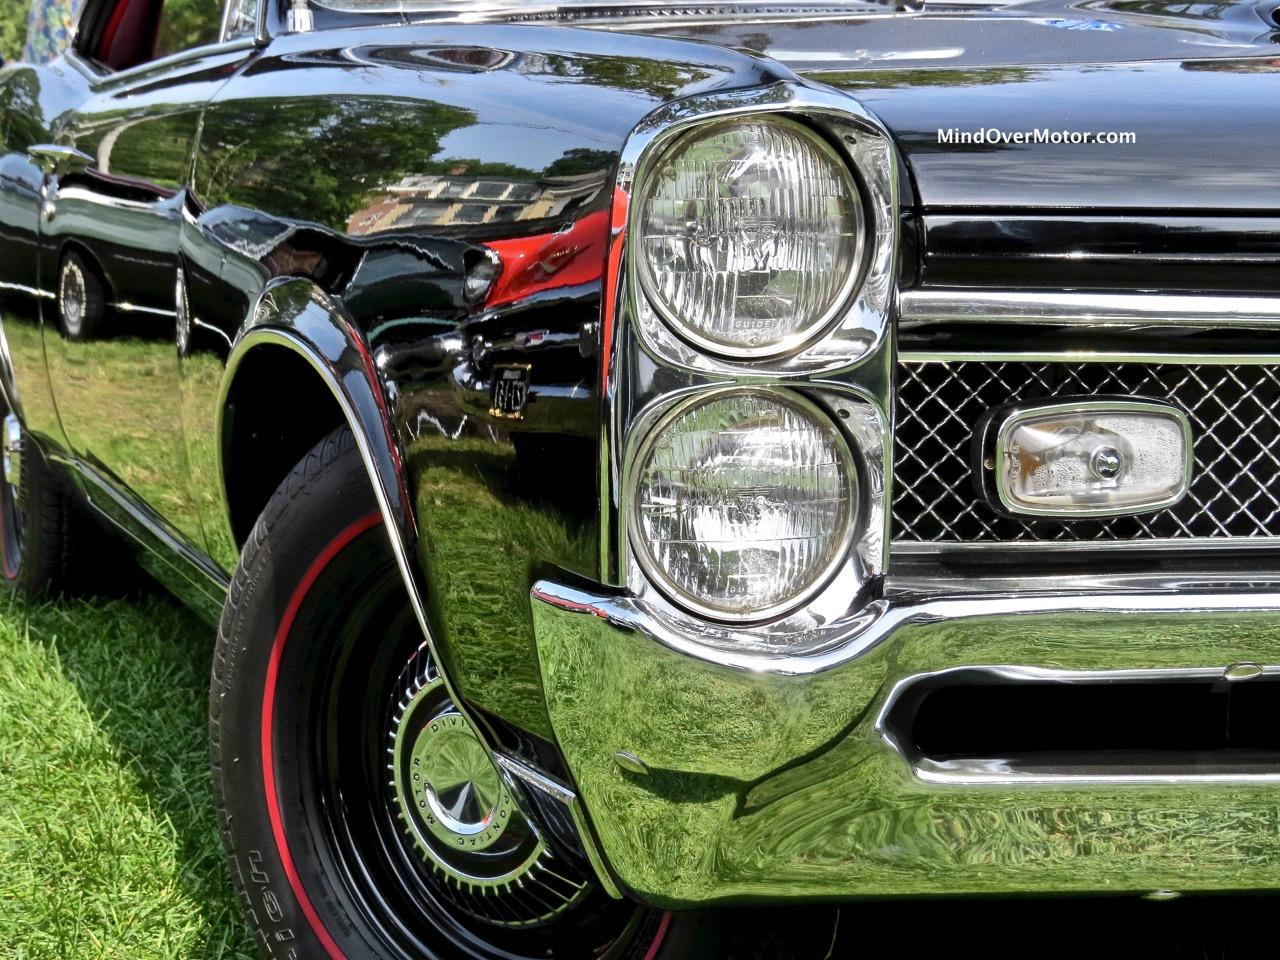 1967 Pontiac GTO Front Corner Detail